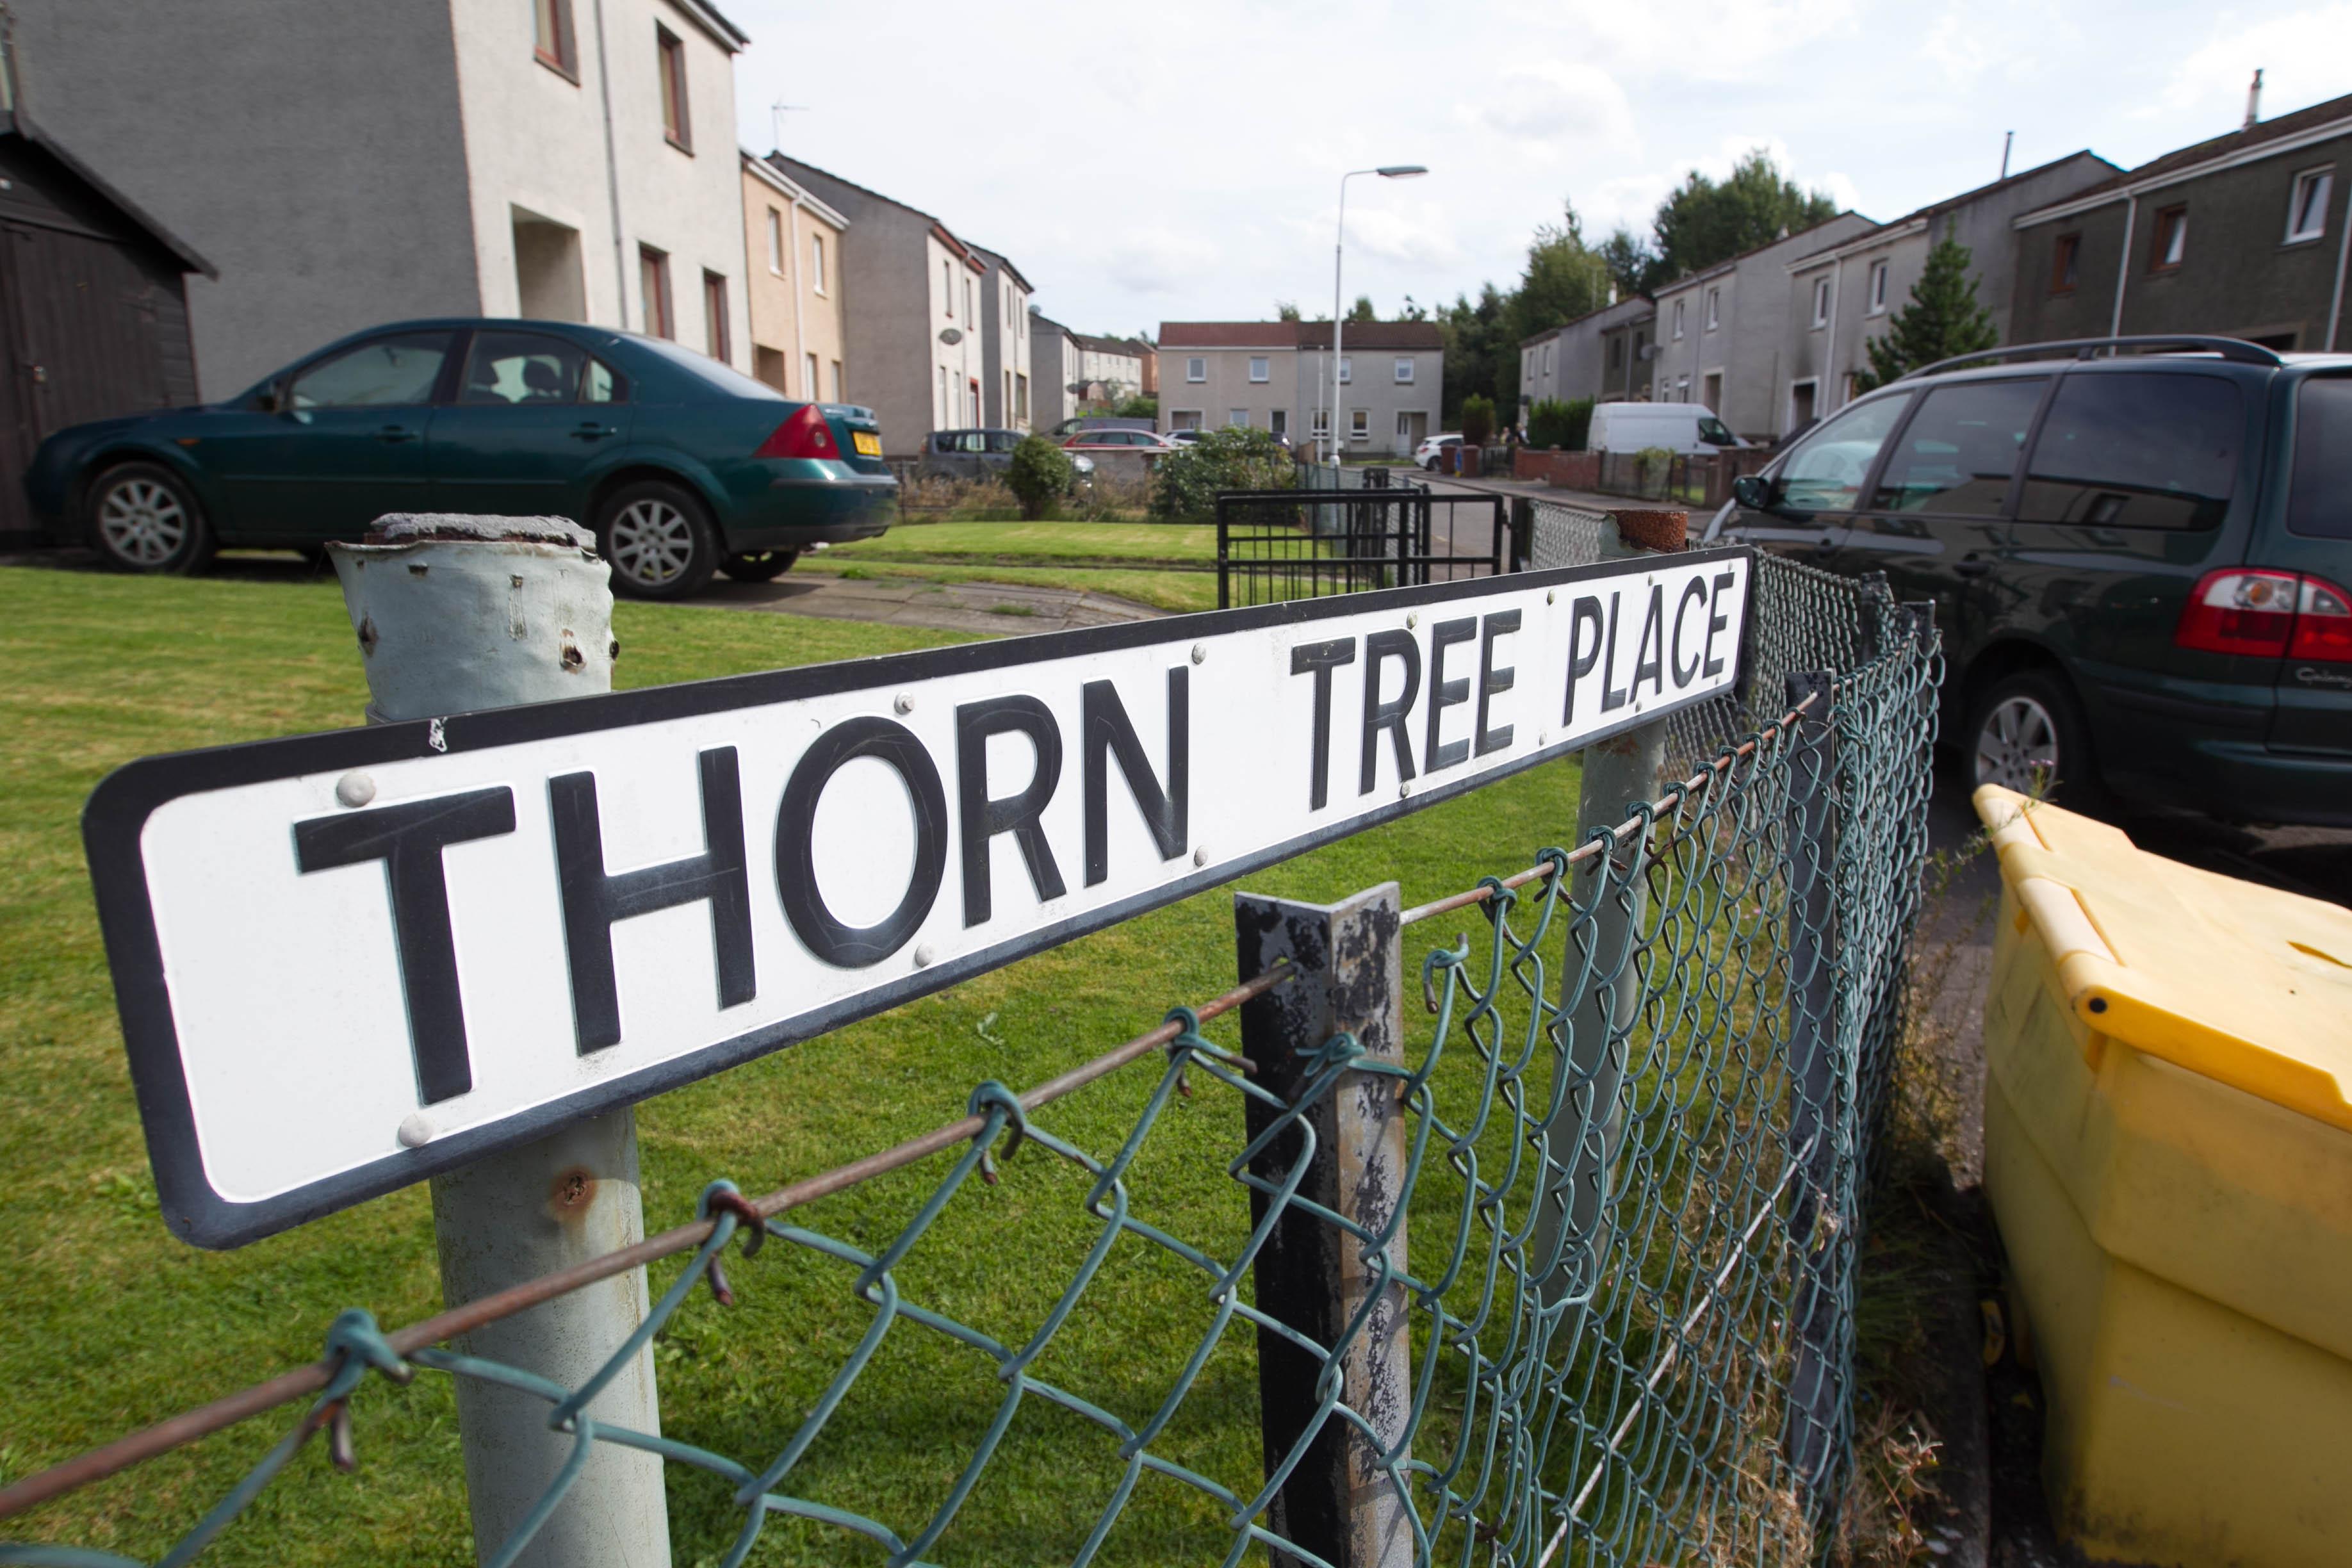 Thorn Tree Place in Oakley.